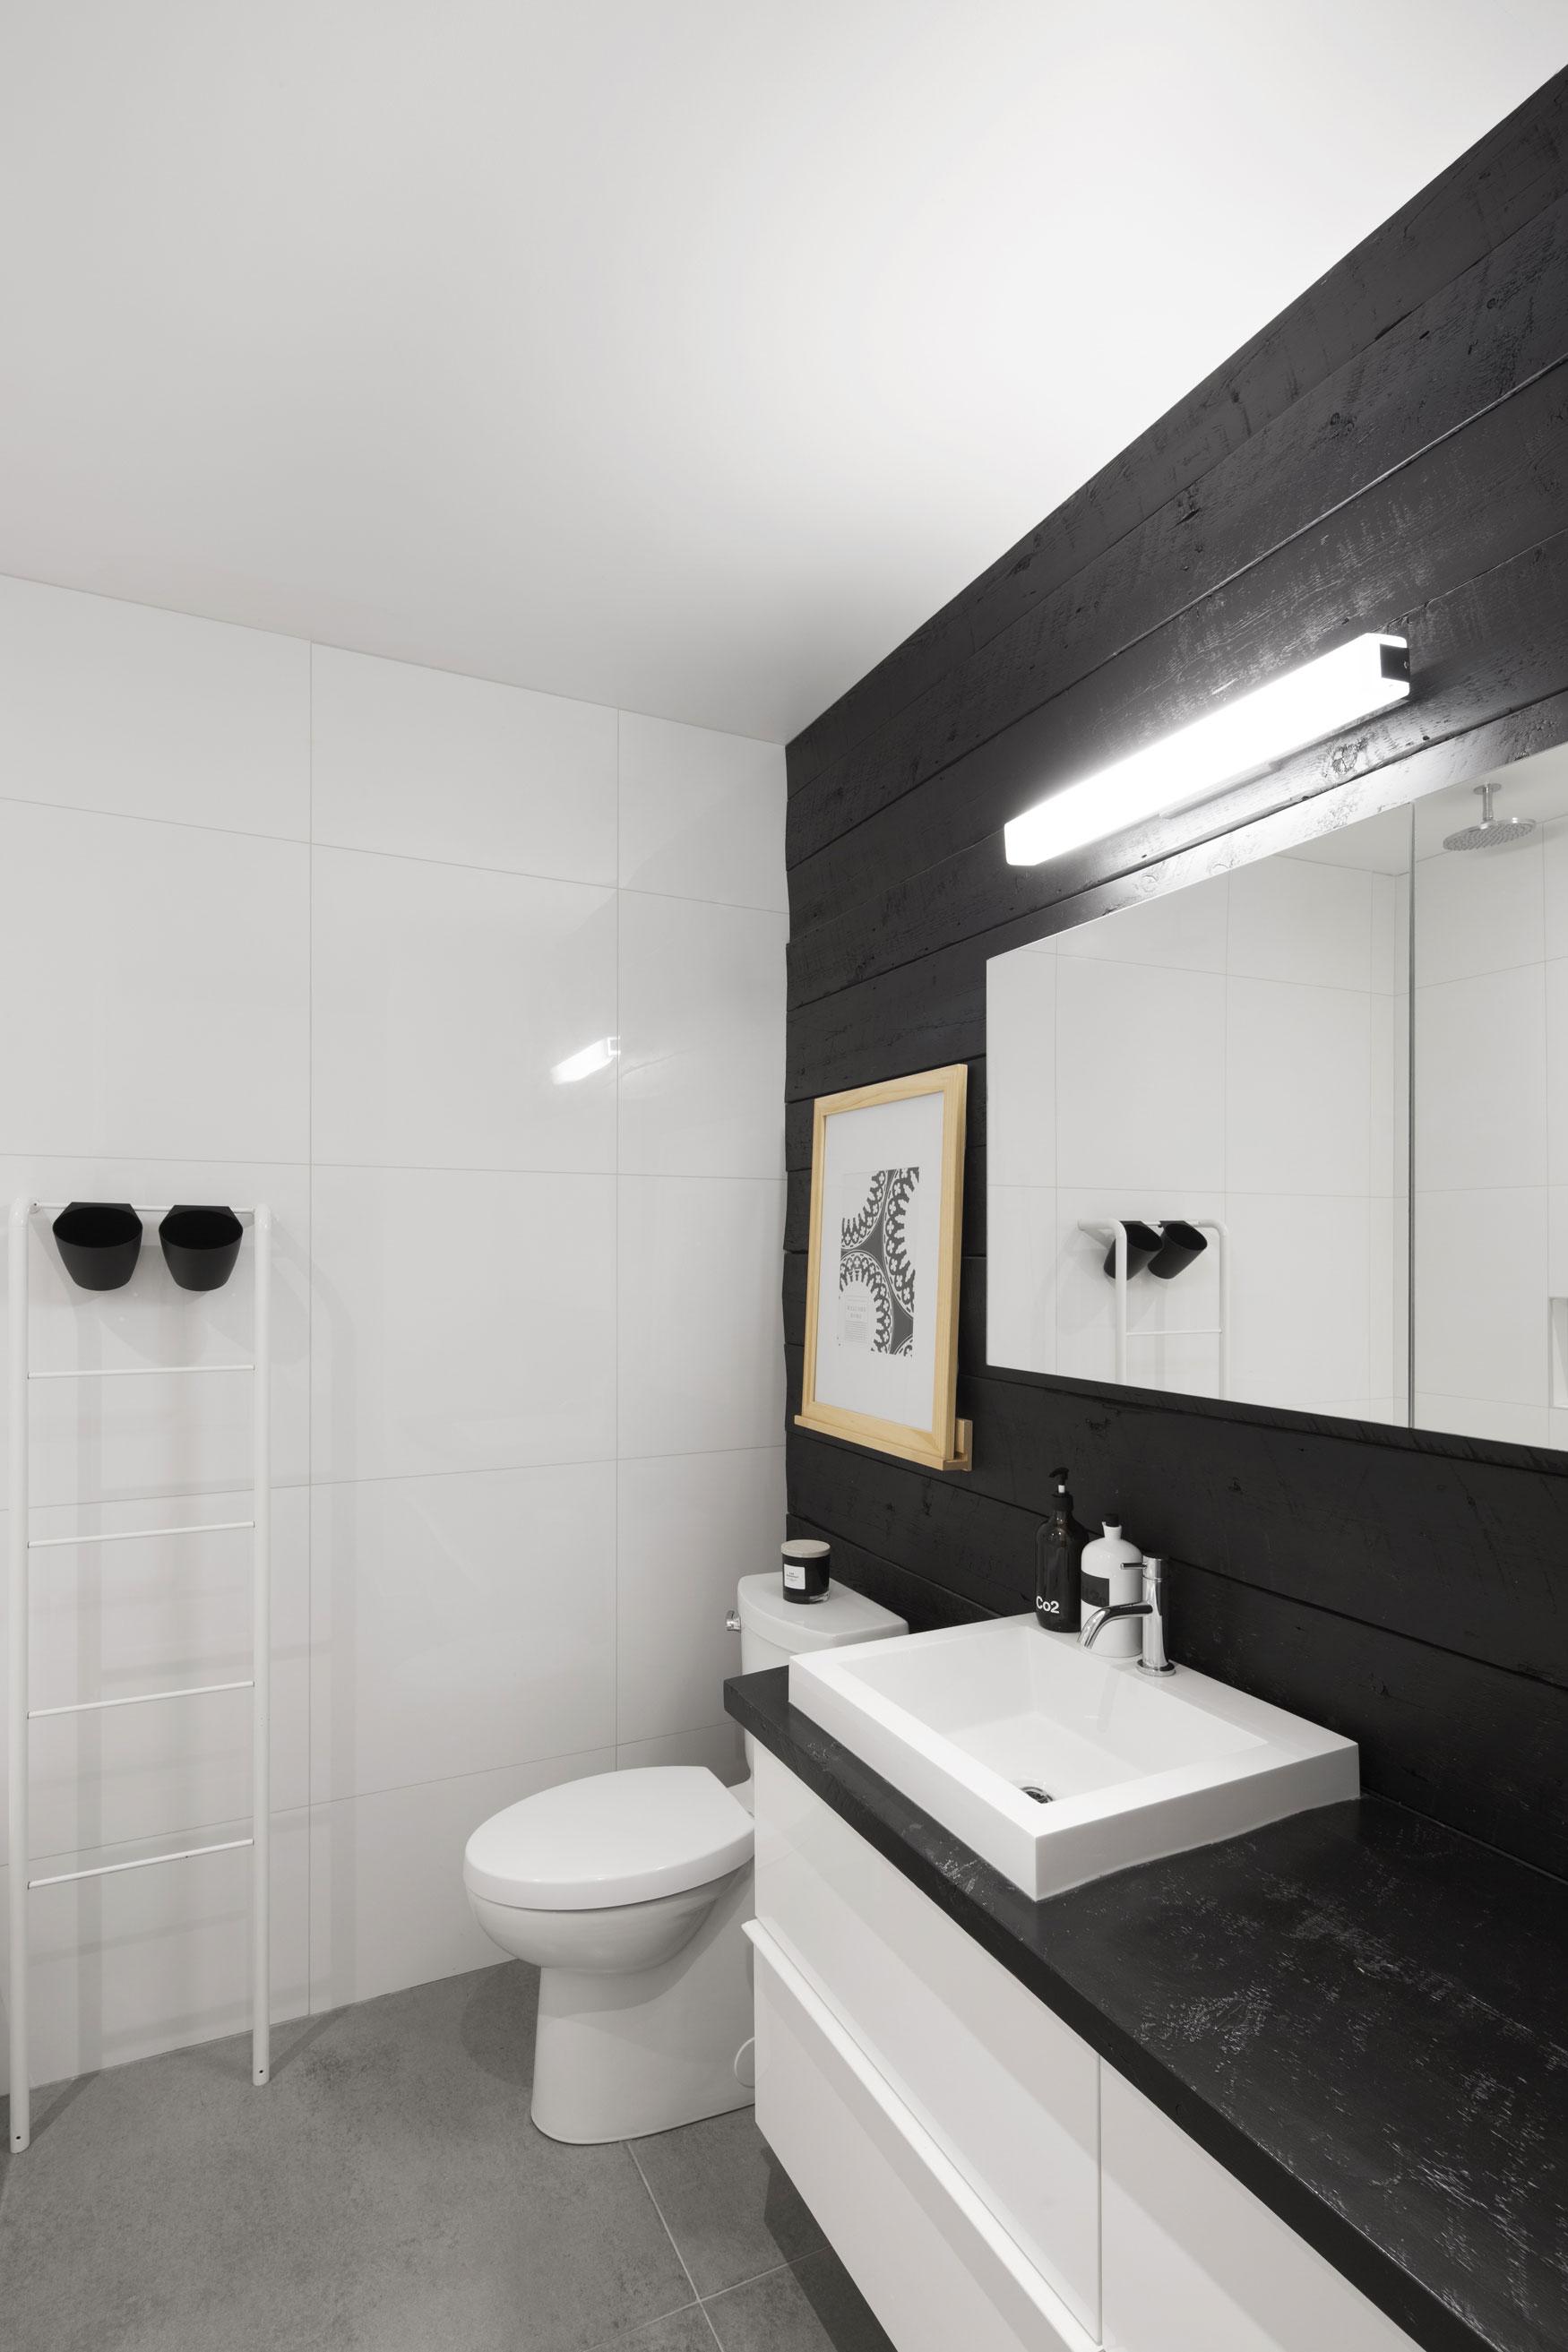 867 De Bougainville Apartment by Bourgeois:Lechasseur architects-10